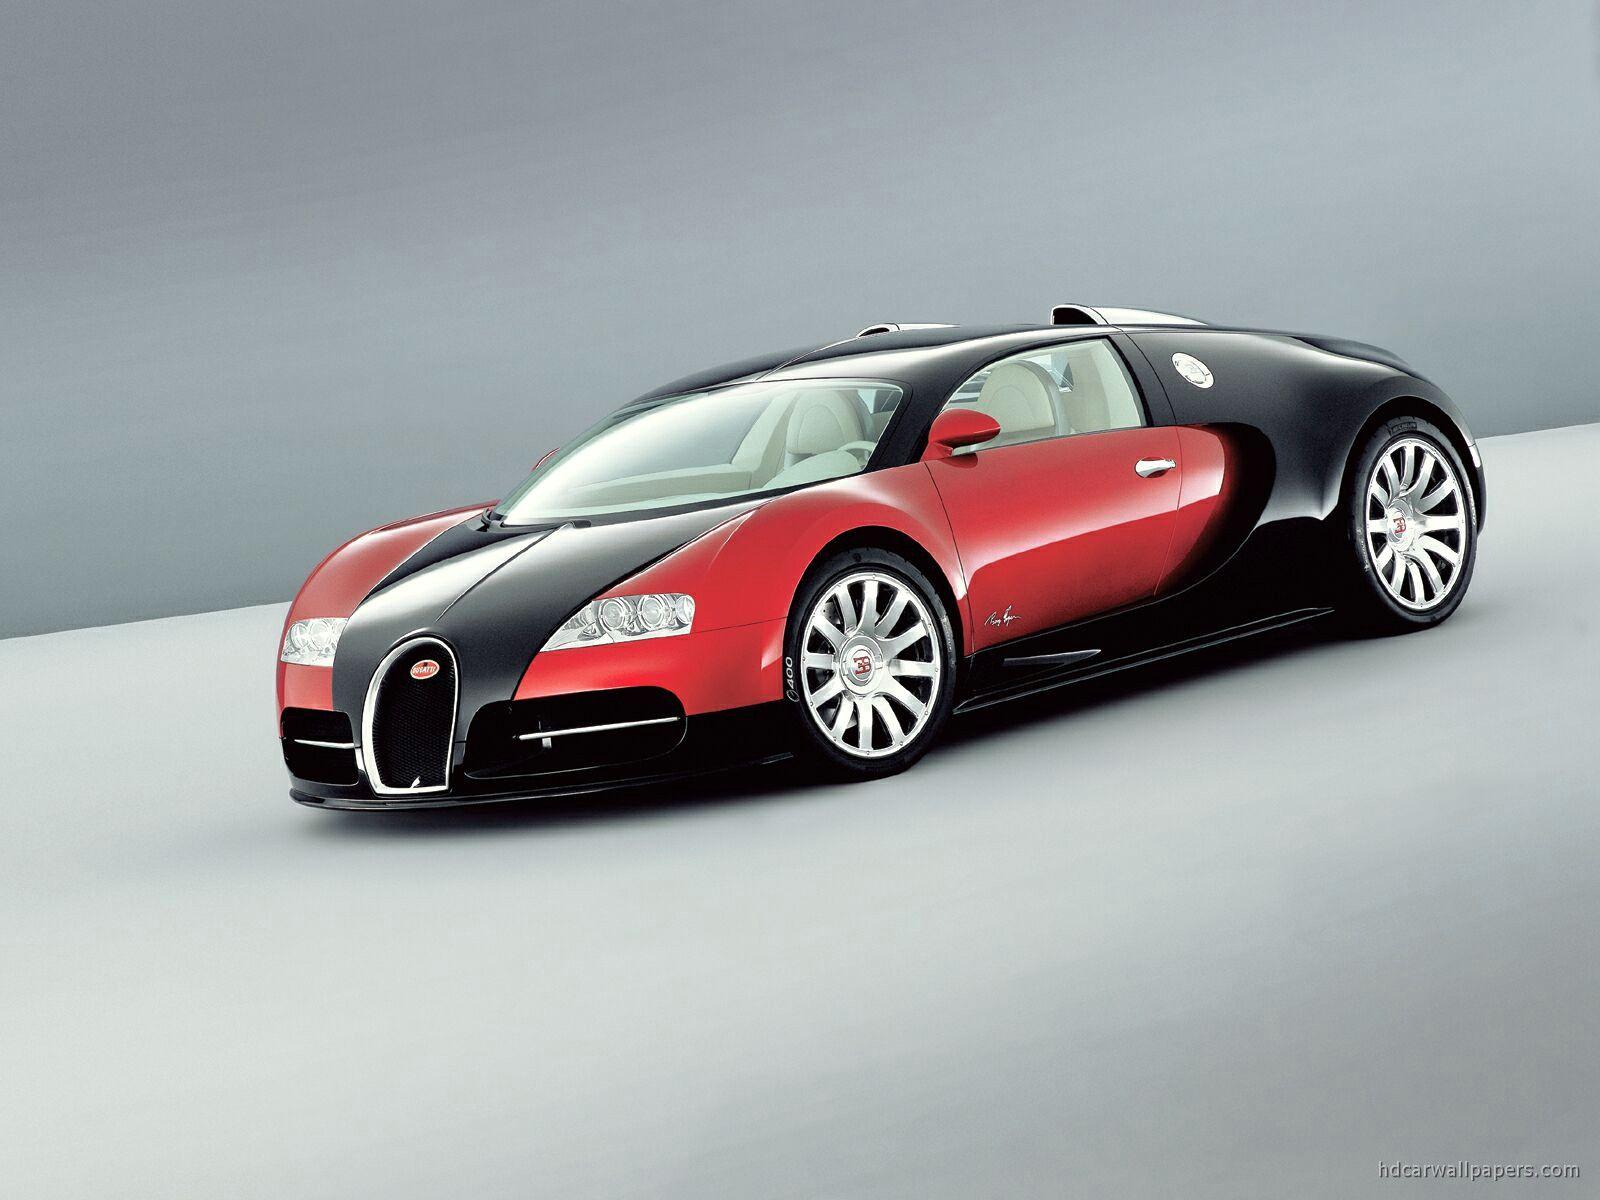 dc63e4aa92dbff975bd196b31de9c51e Inspiring Bugatti Veyron Quarter Mile Speed Cars Trend